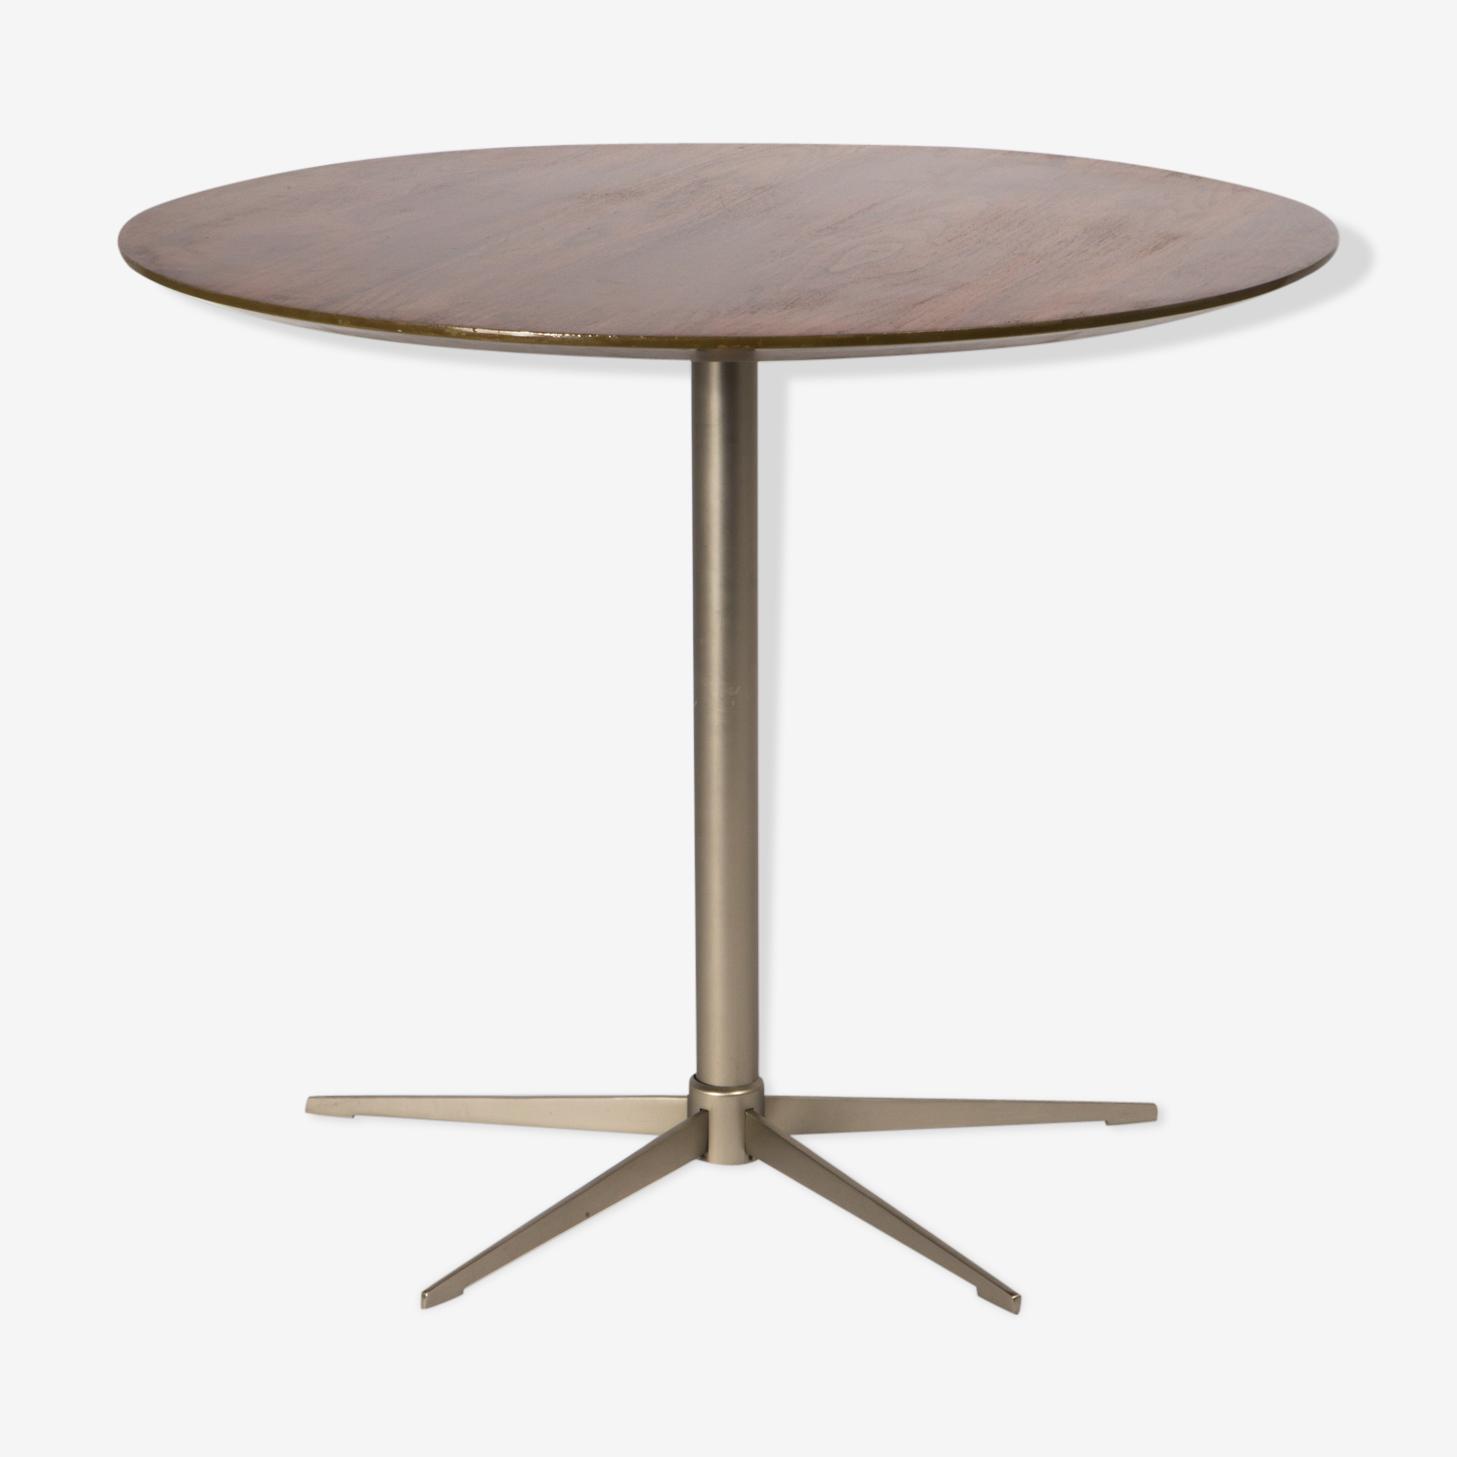 Table top teak base star